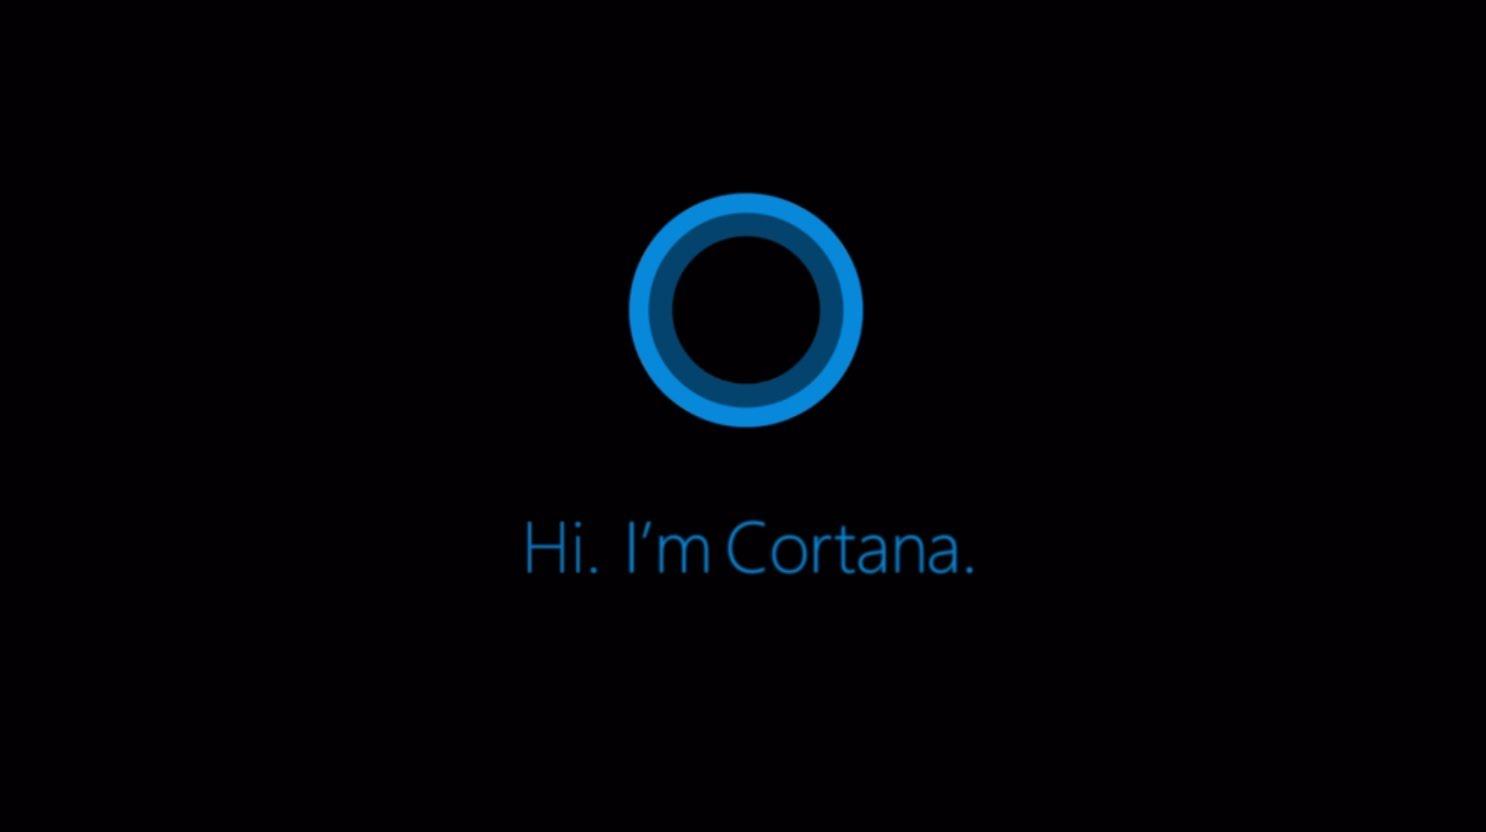 Hlasová asistenka Cortana již brzy pro Android a iOS